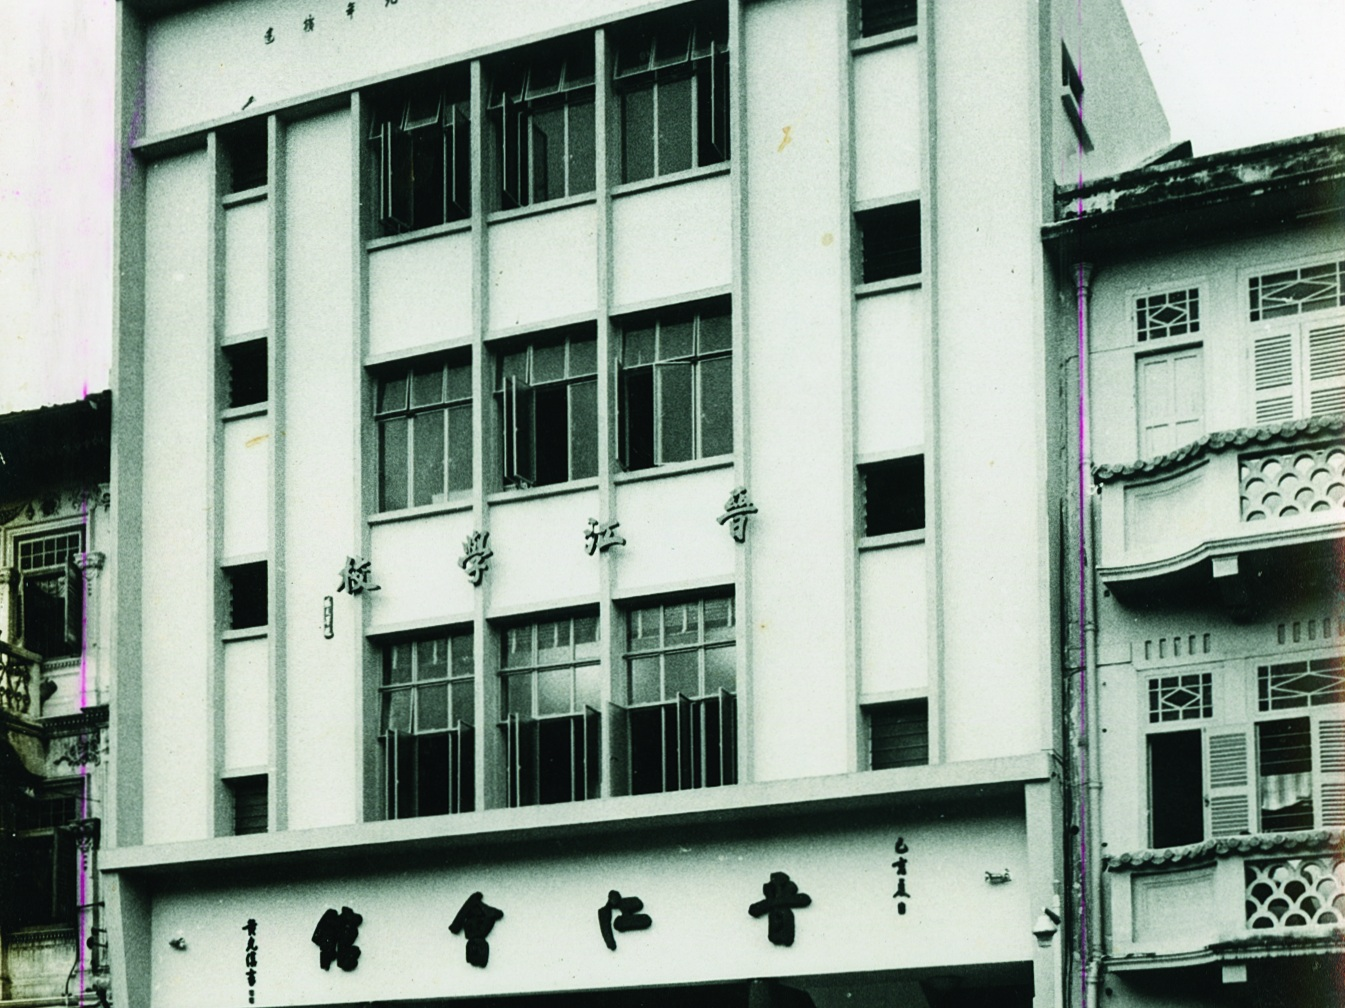 Chin Kang School